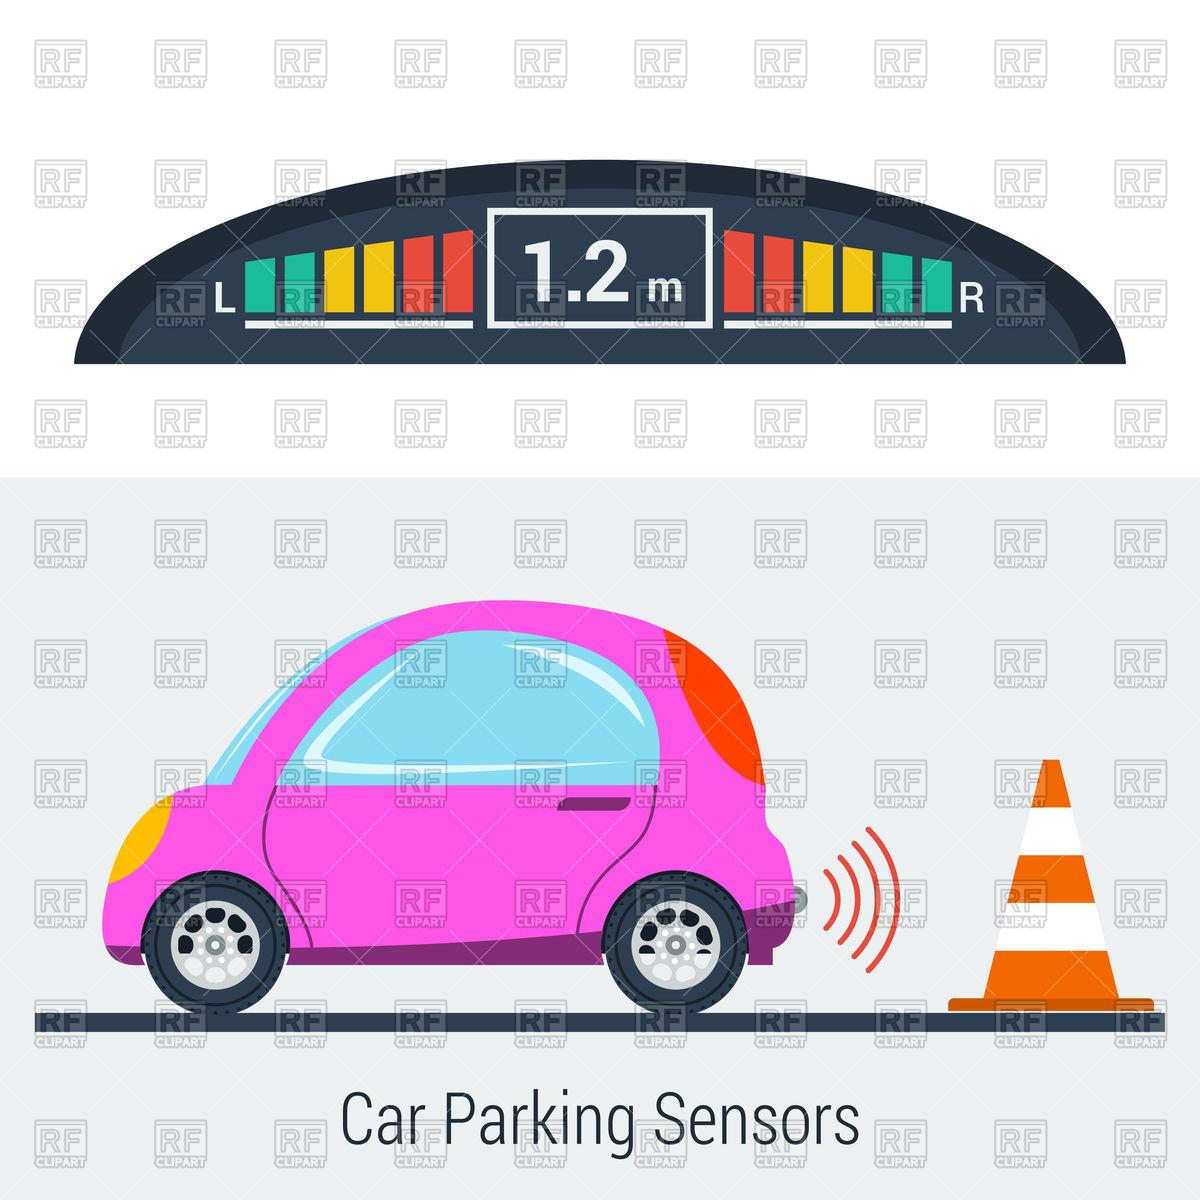 1200x1200 Parktronic Concept. Small Car Parking Backwards With Bumper Sensor